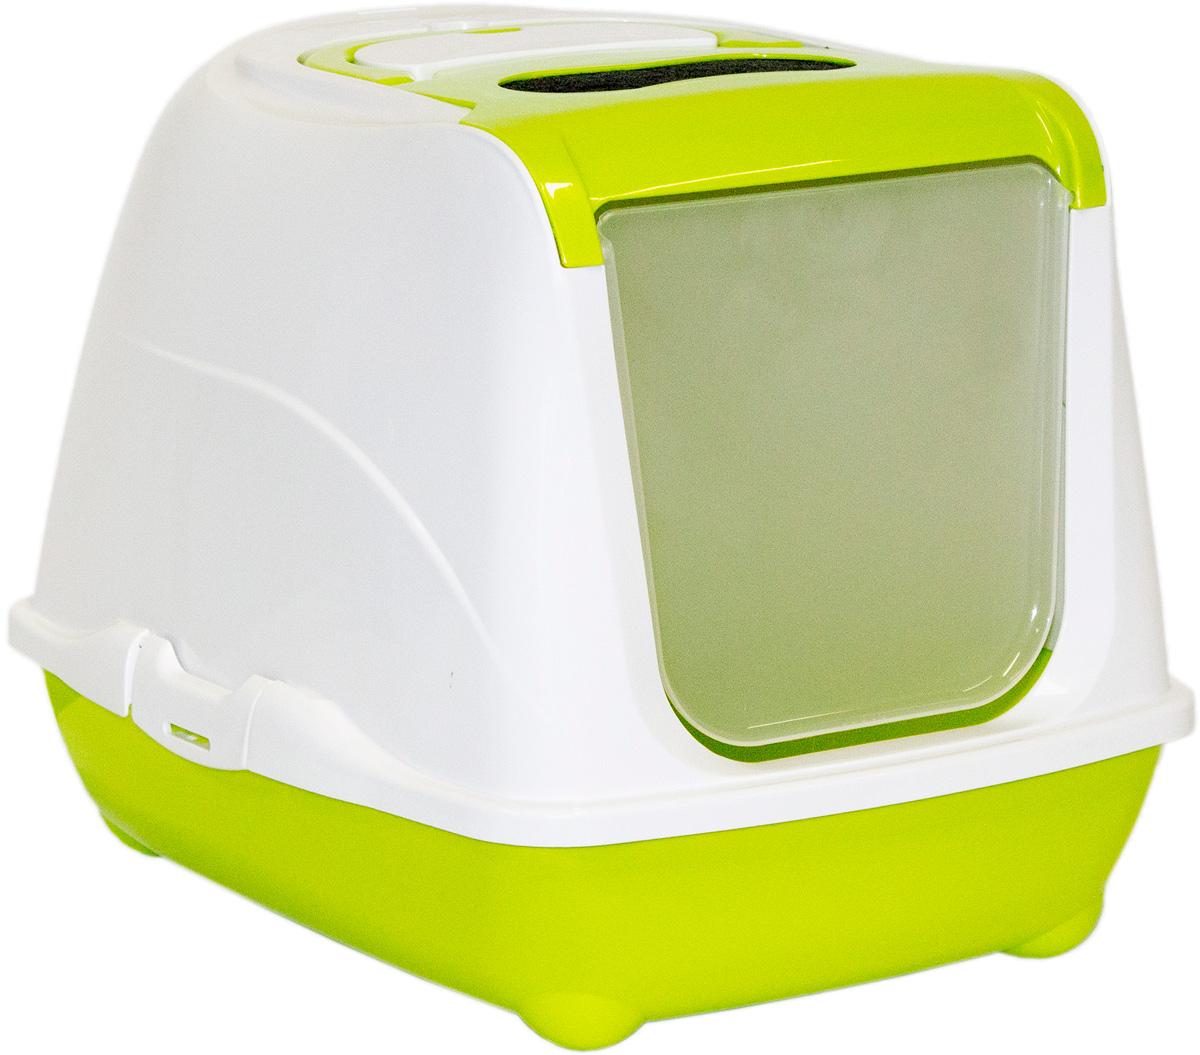 Туалет закрытый для кошек Moderna Flip Cat, цвет: зеленый, 39х50х37 см14C230173